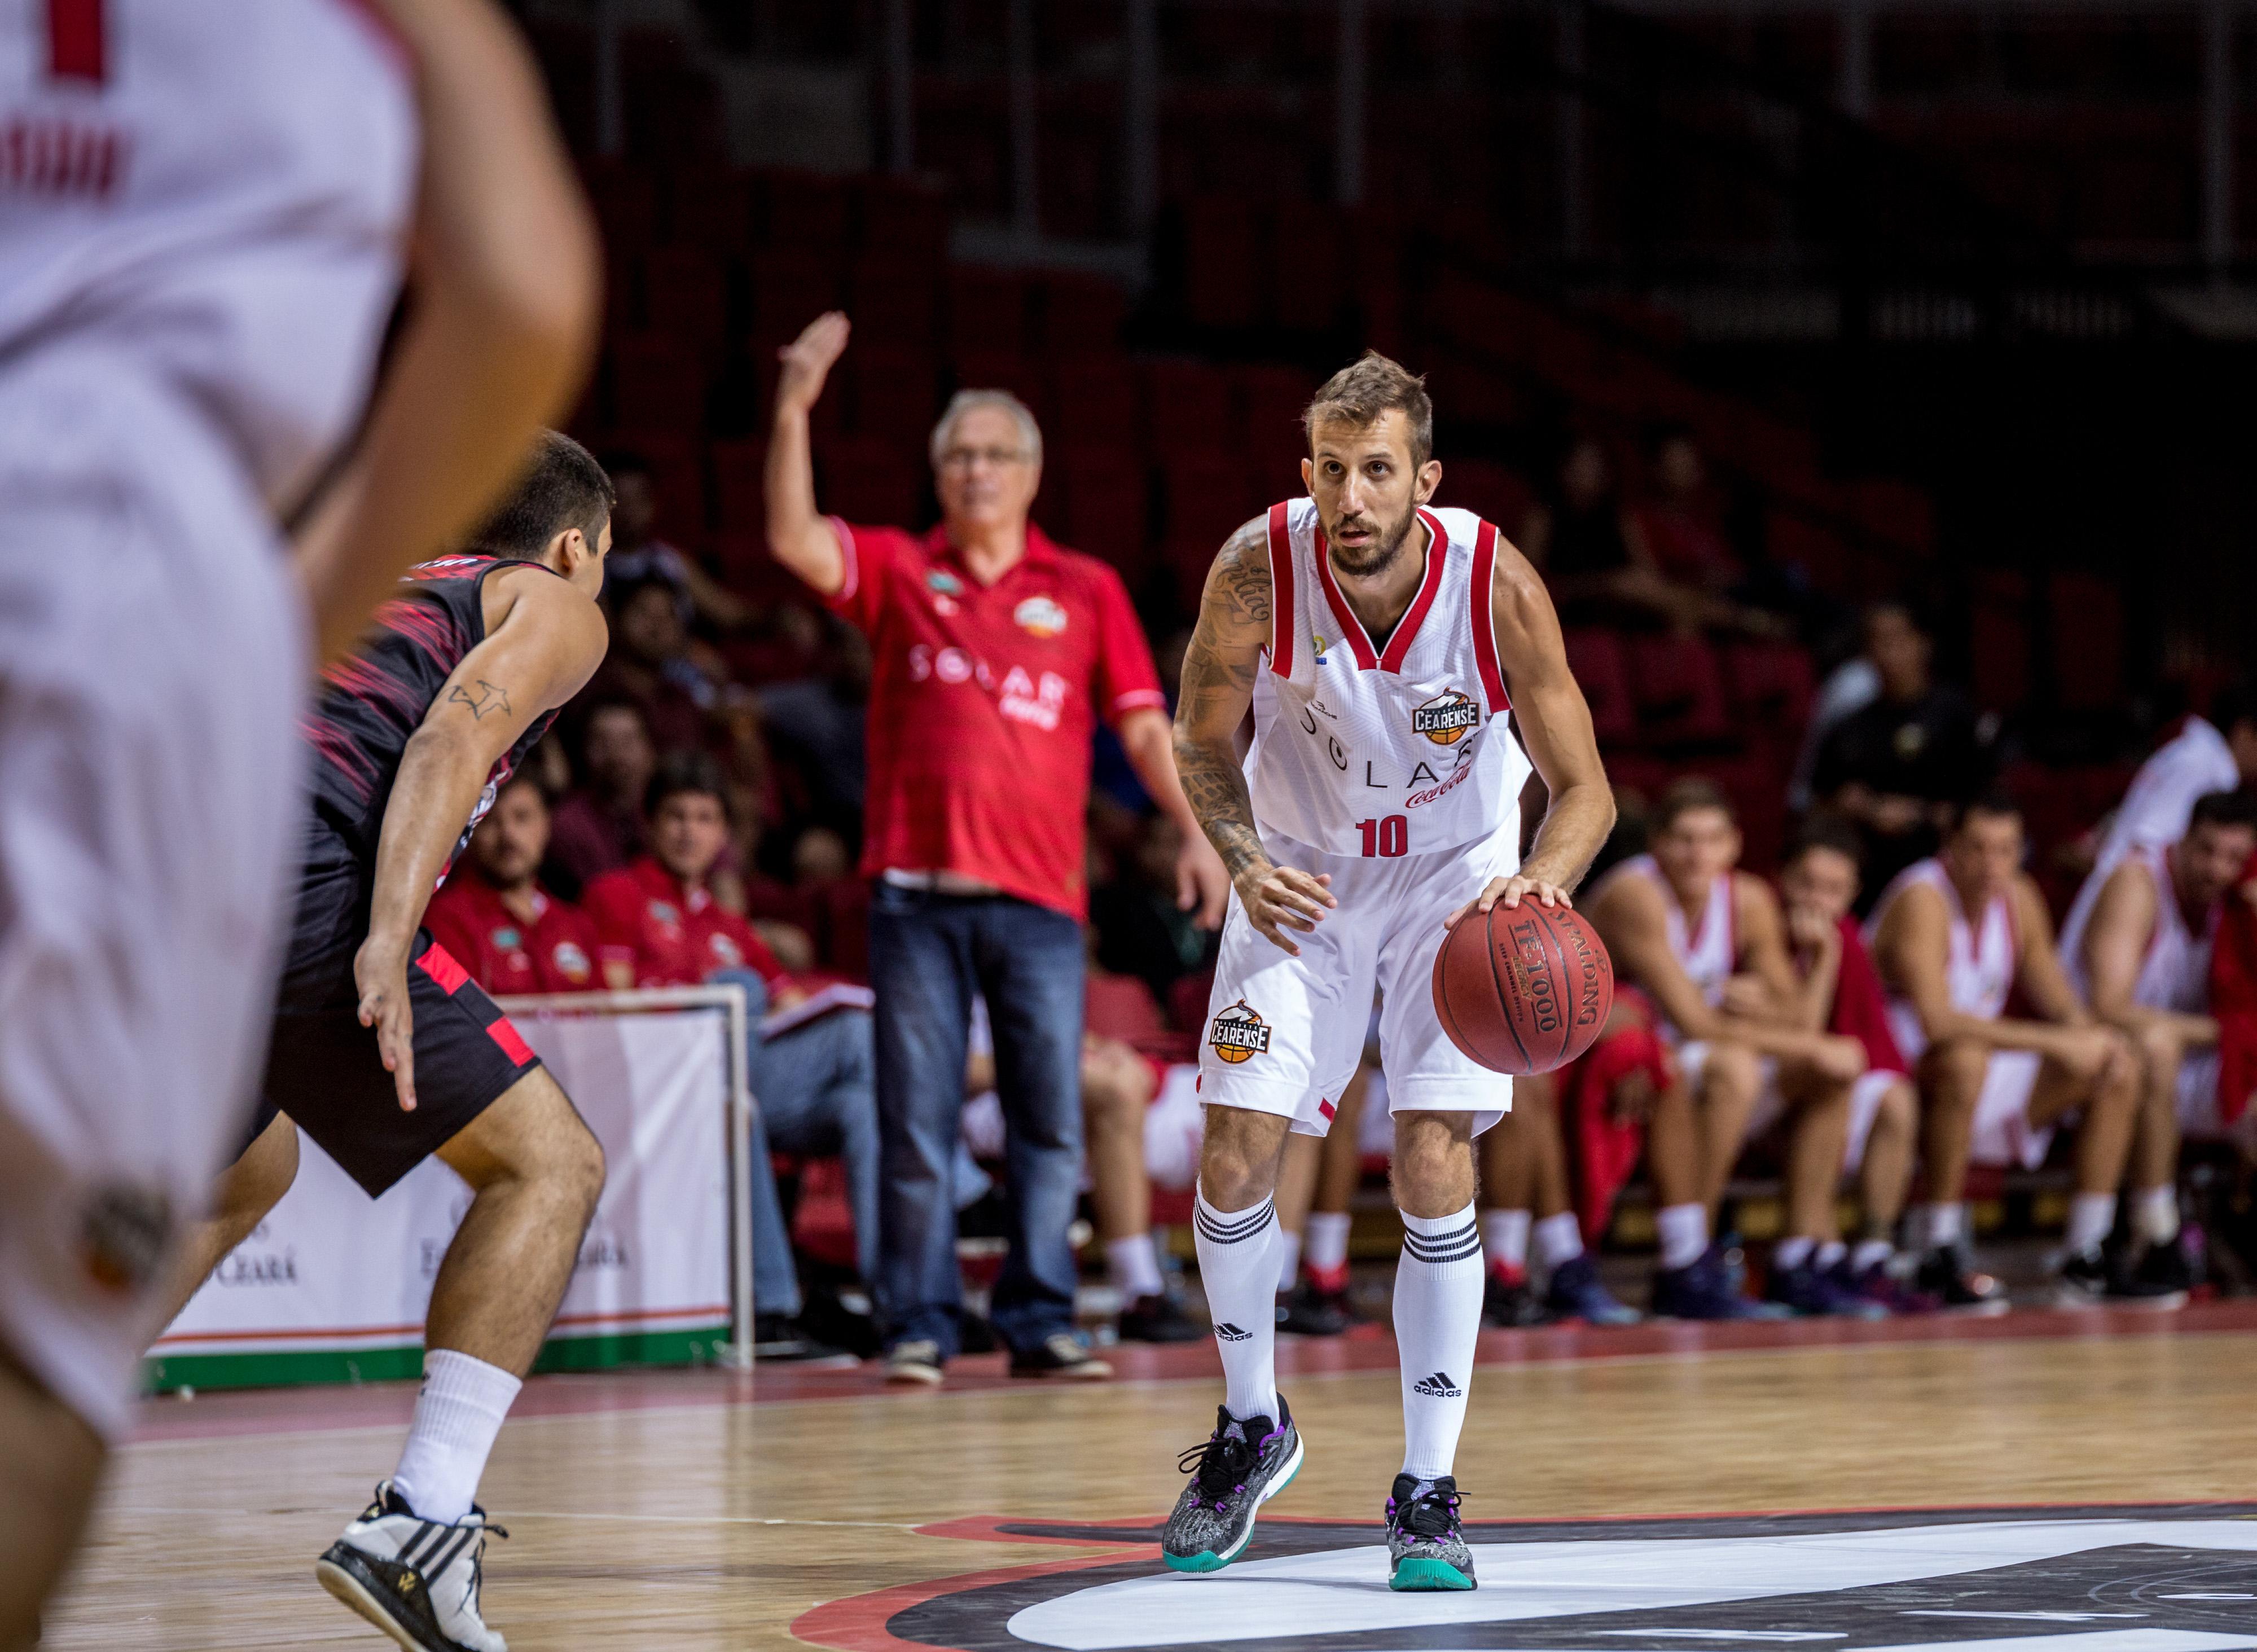 basquete-cearense-meio004